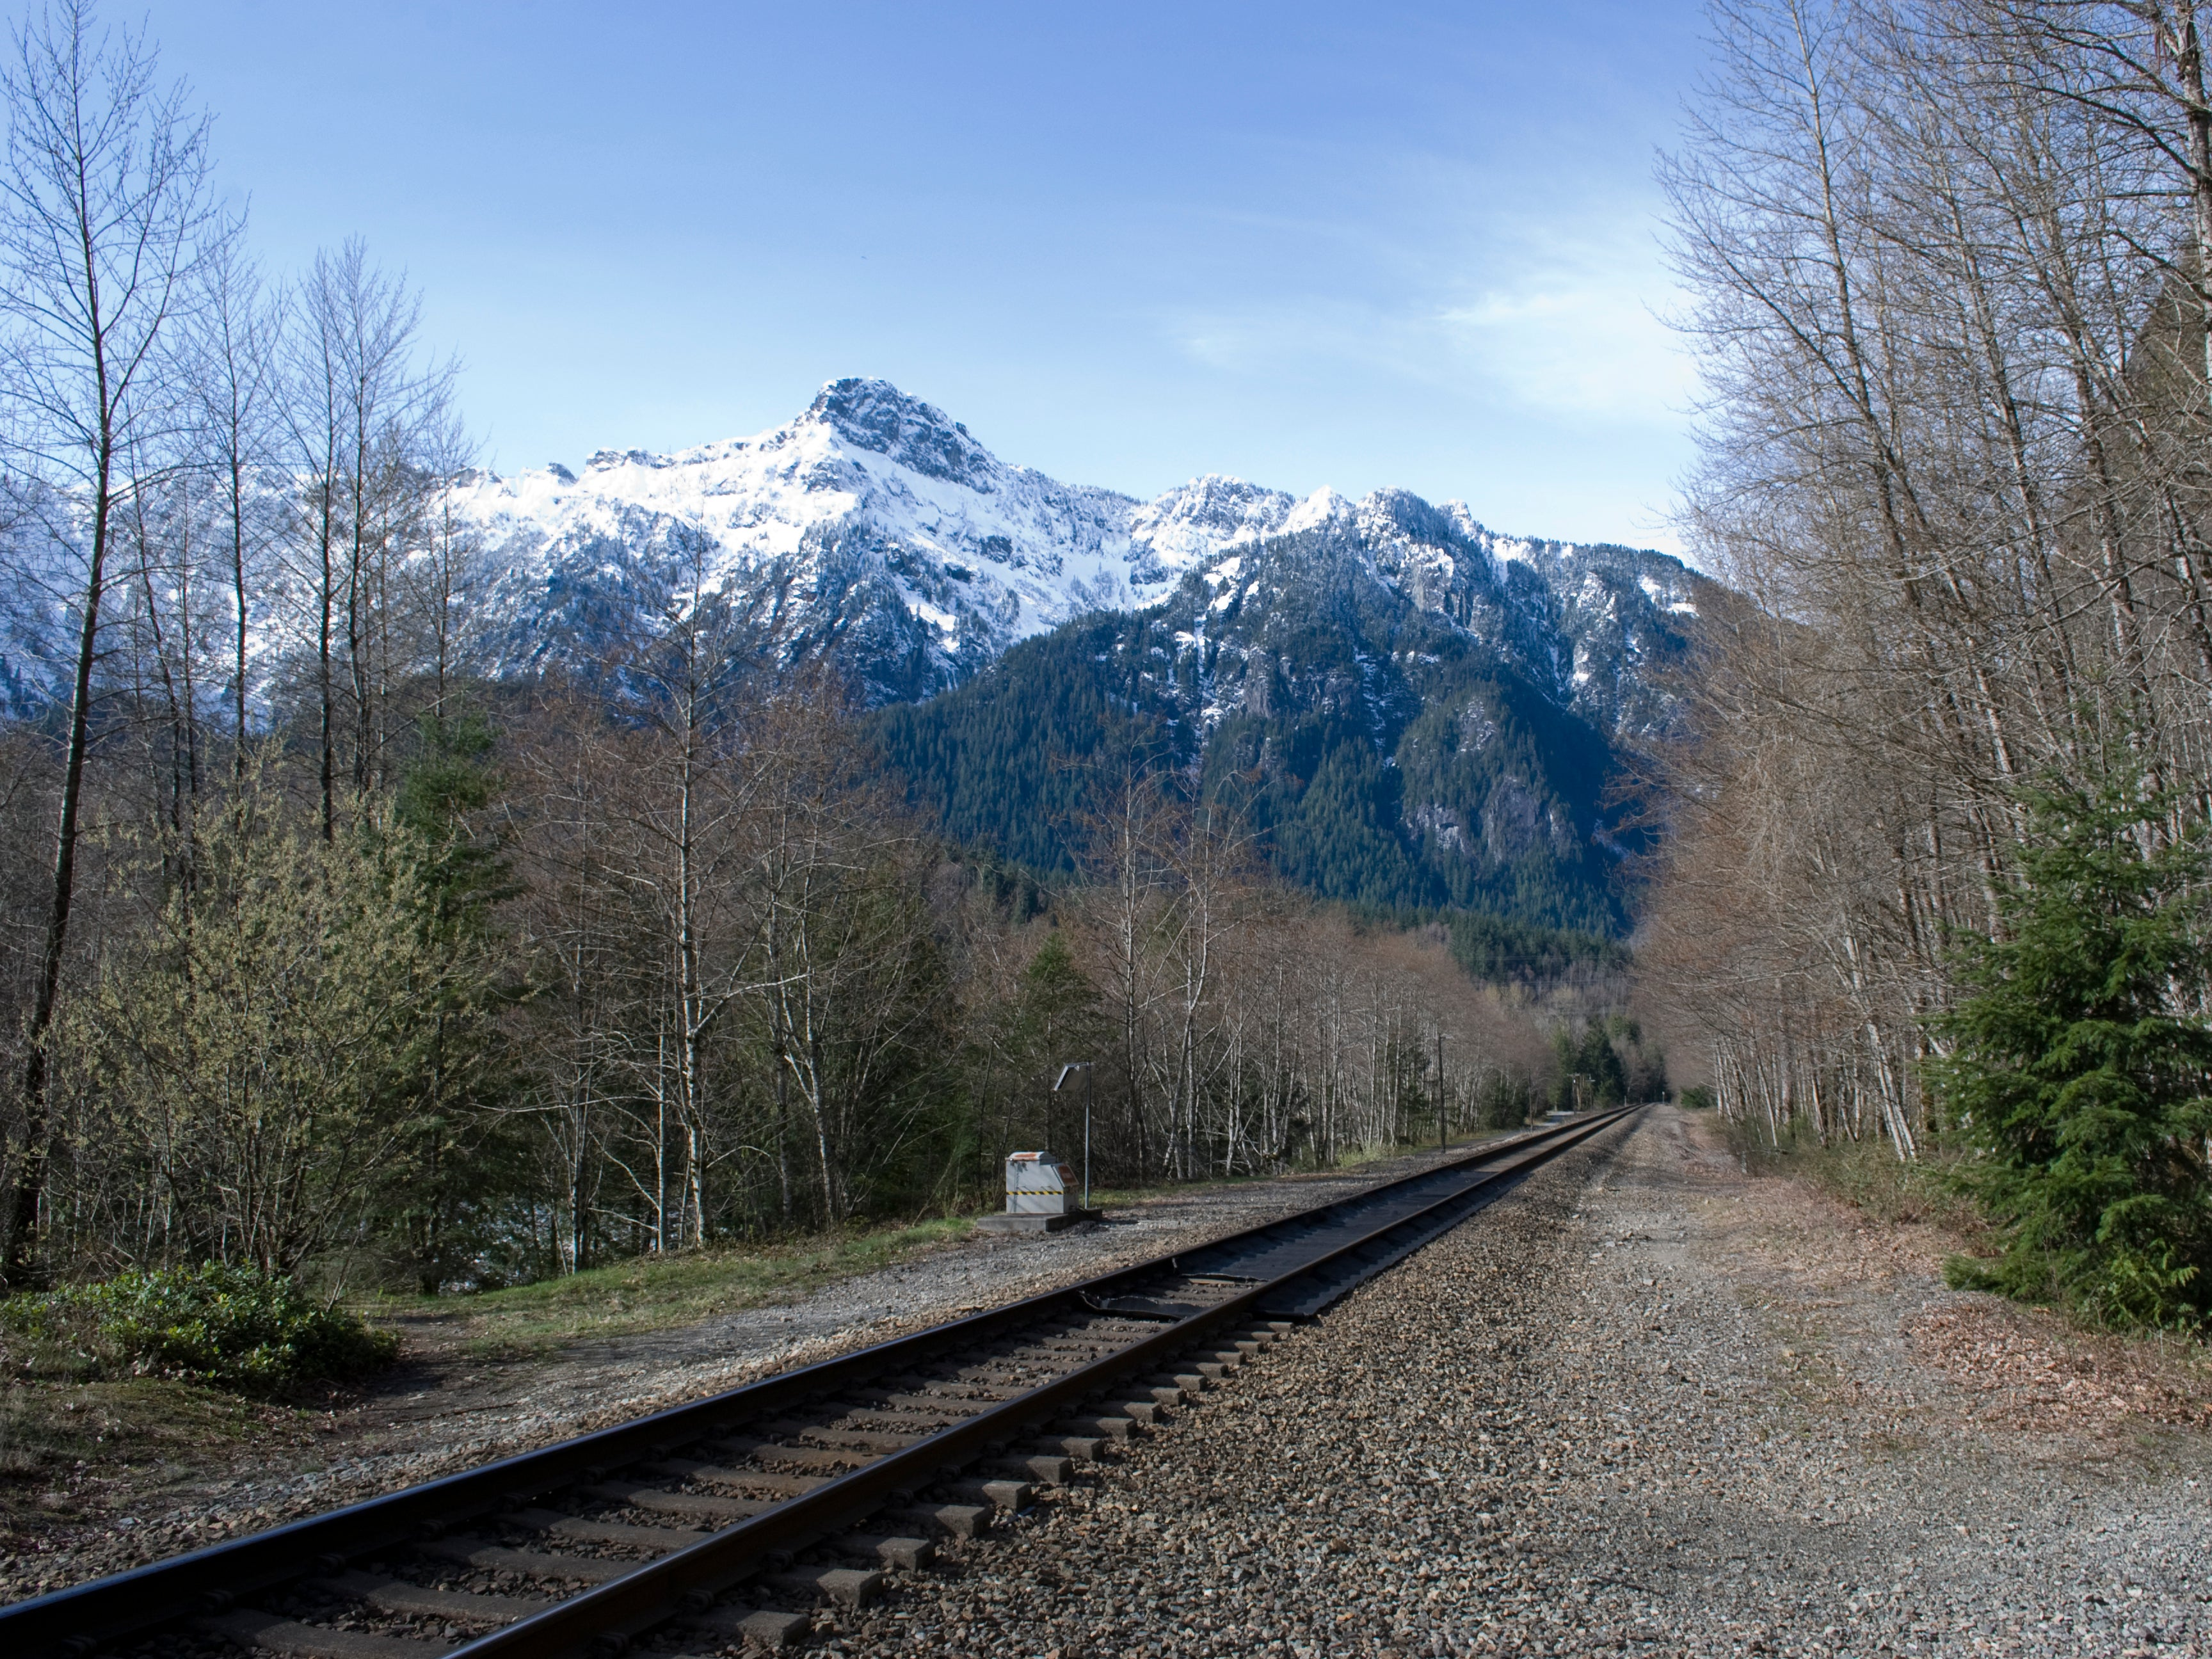 Wildest hikes Mt. Washington, NH